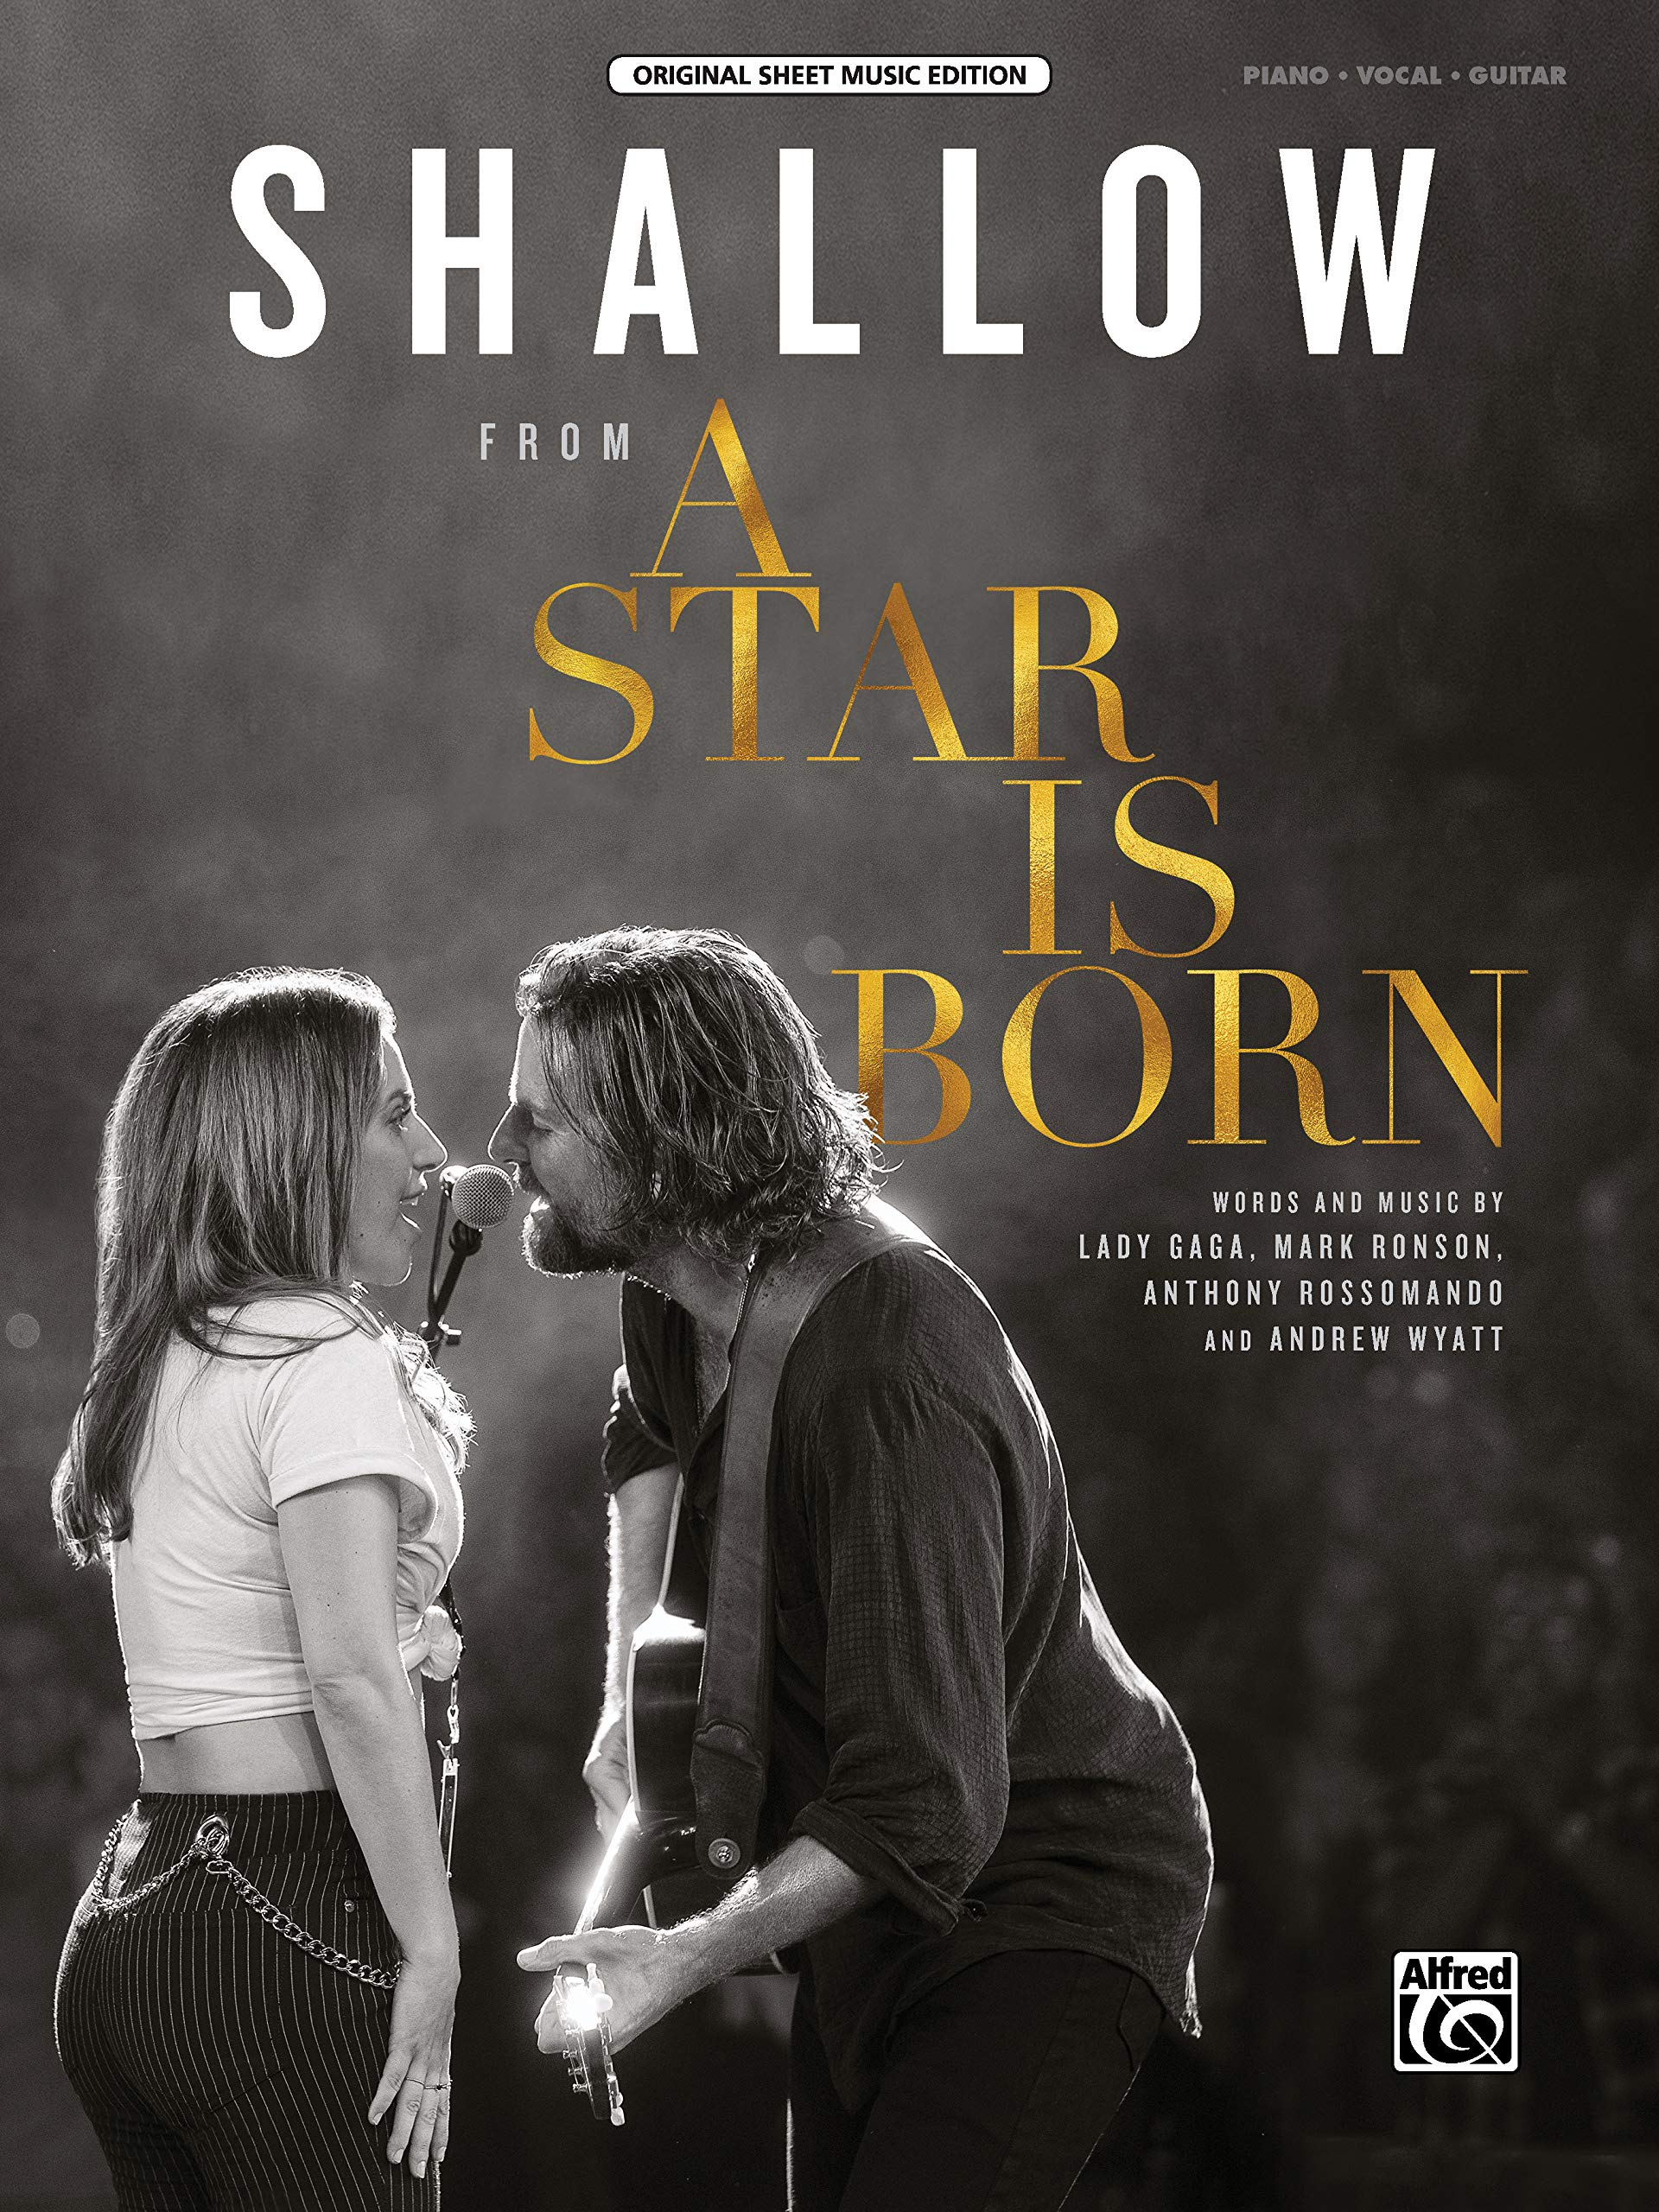 Shallow From A Star Is Born Sheet Original Sheet Music Edition Gaga Lady Ronson Mark Rossomando Anthony Wyatt Andrew 9781470641528 Amazon Com Books